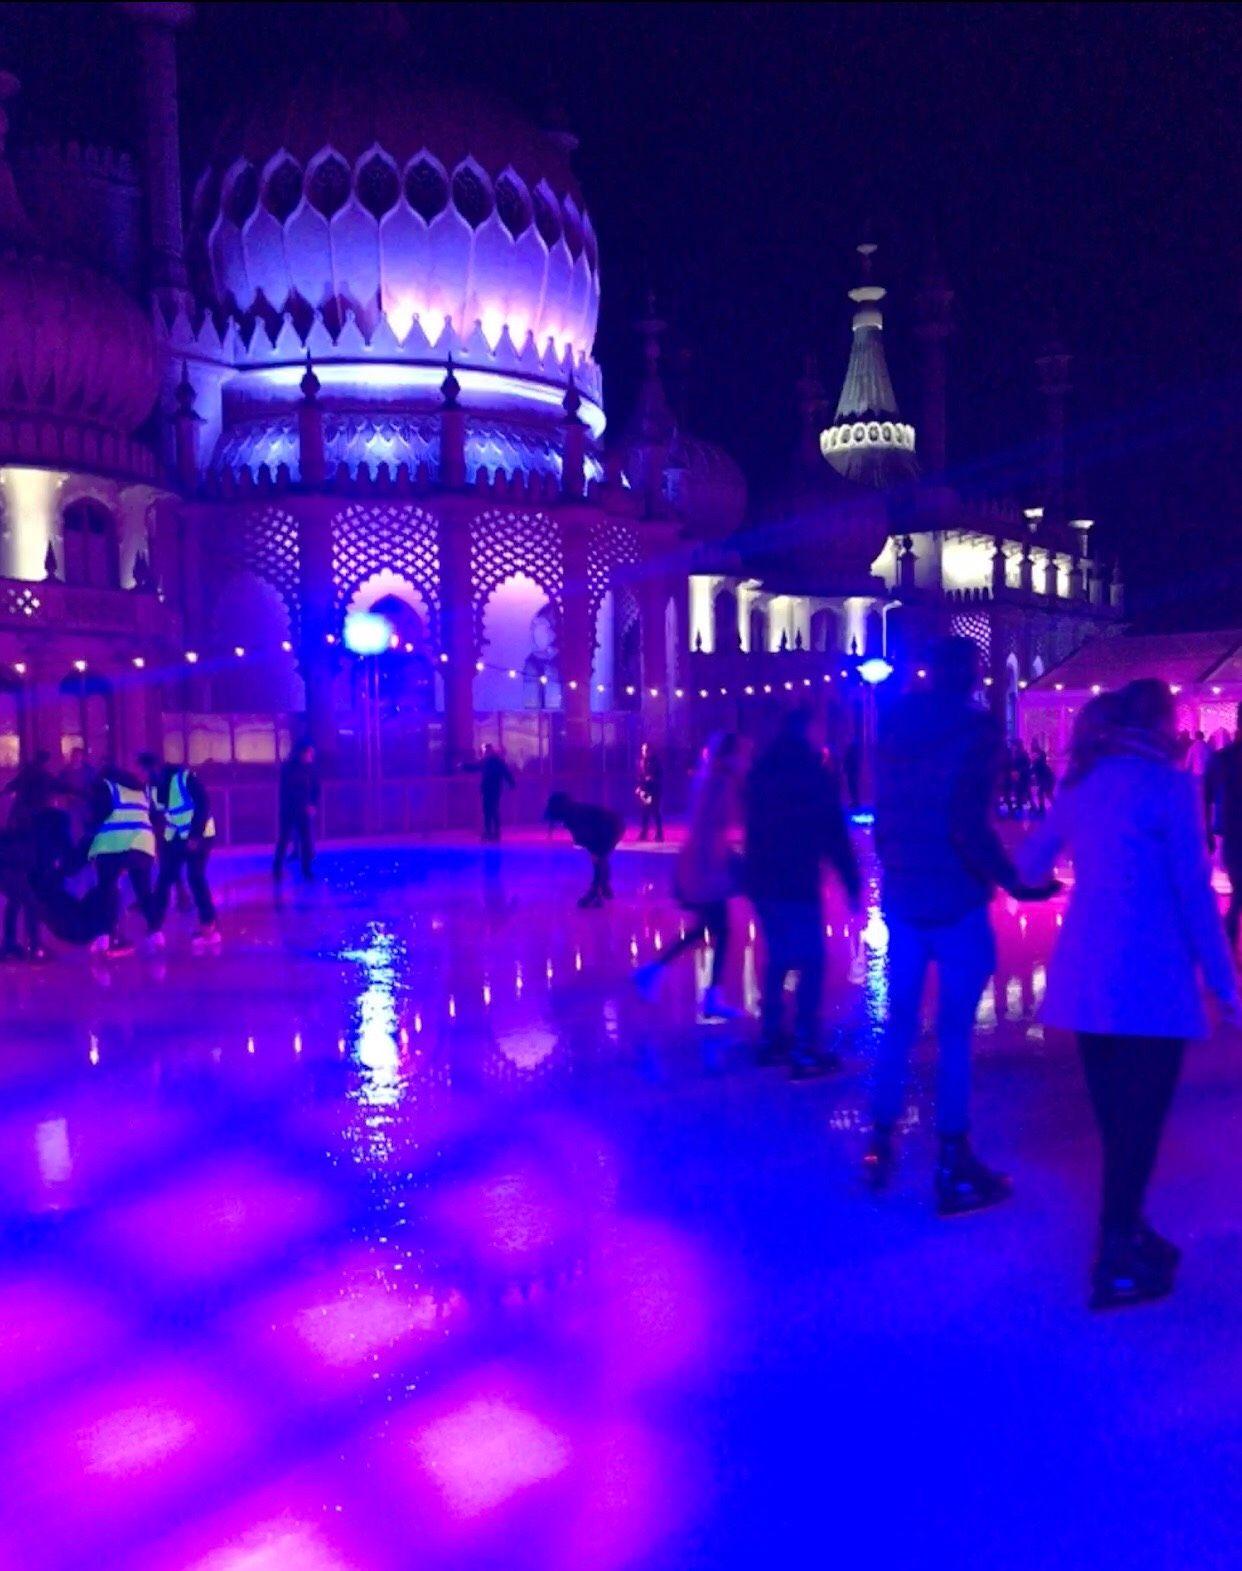 Image may contain: Rink, Club, Ice Skating, Sport, Sports, Skating, Lighting, Human, Person